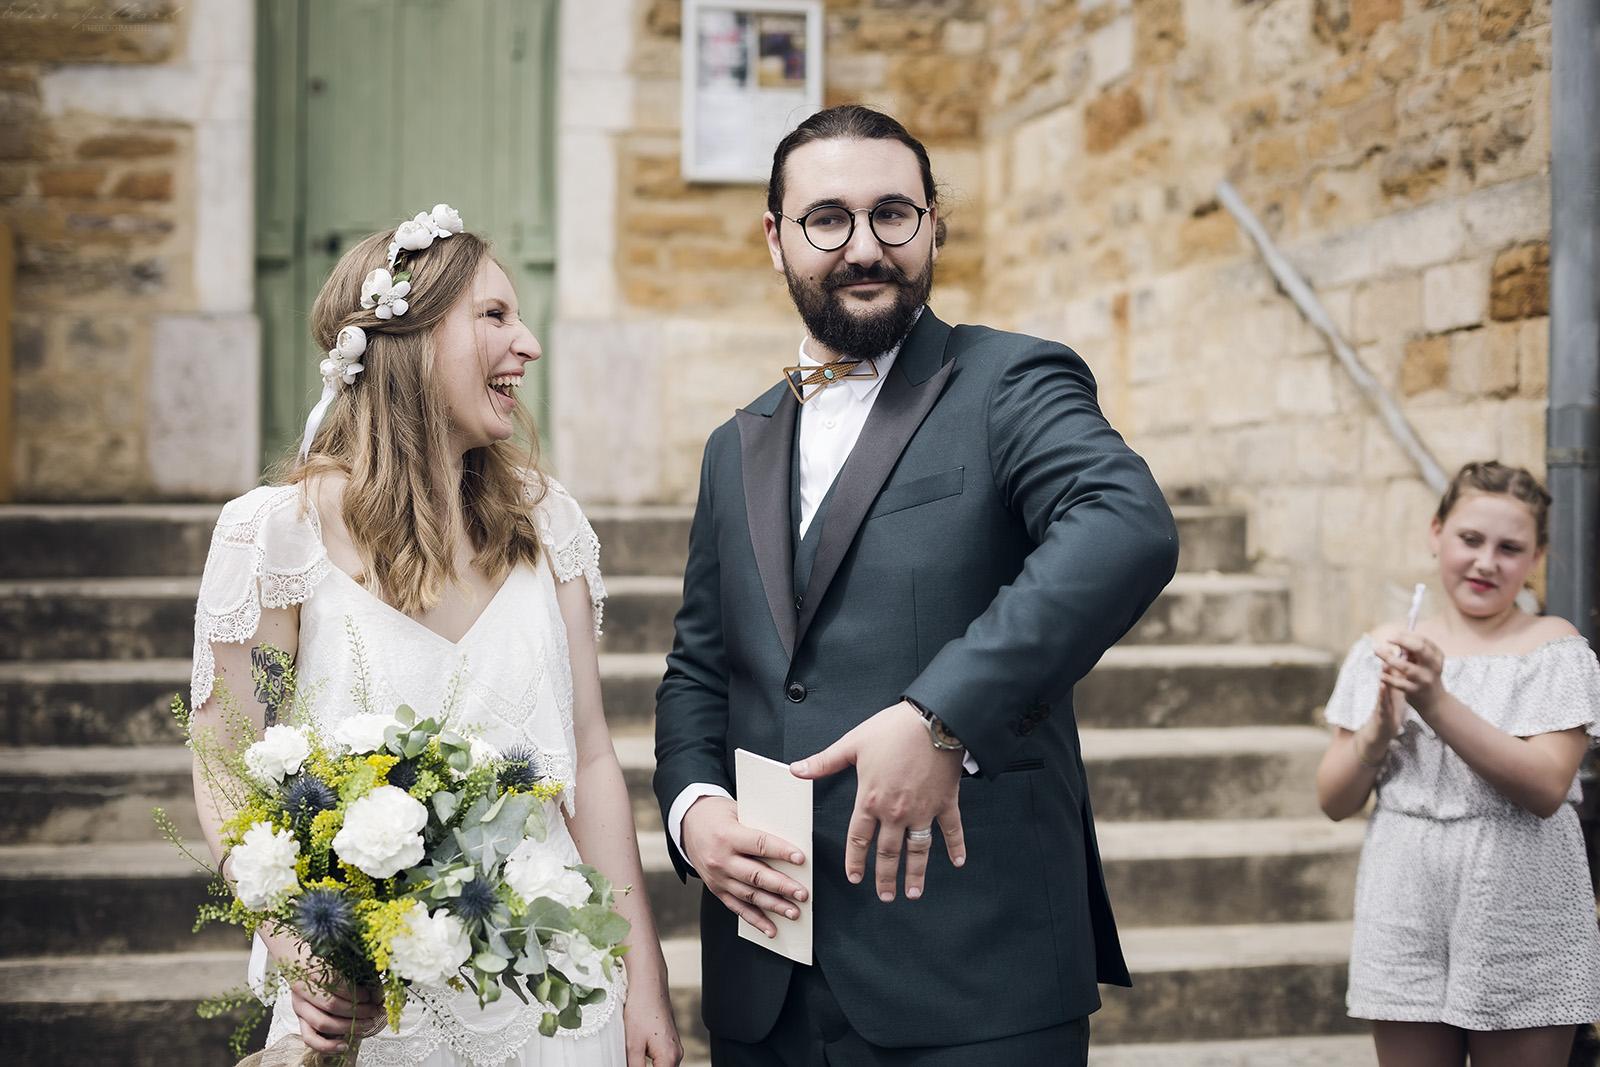 mariage-wedding-photographe-photographer-reportage-seance-photo-couple-amoureux-amour-famille-domaine-du-petit-chambard-auvergne-rhone-alpes-ain-lyon-bourg-en-bresse-elise-julliard-5